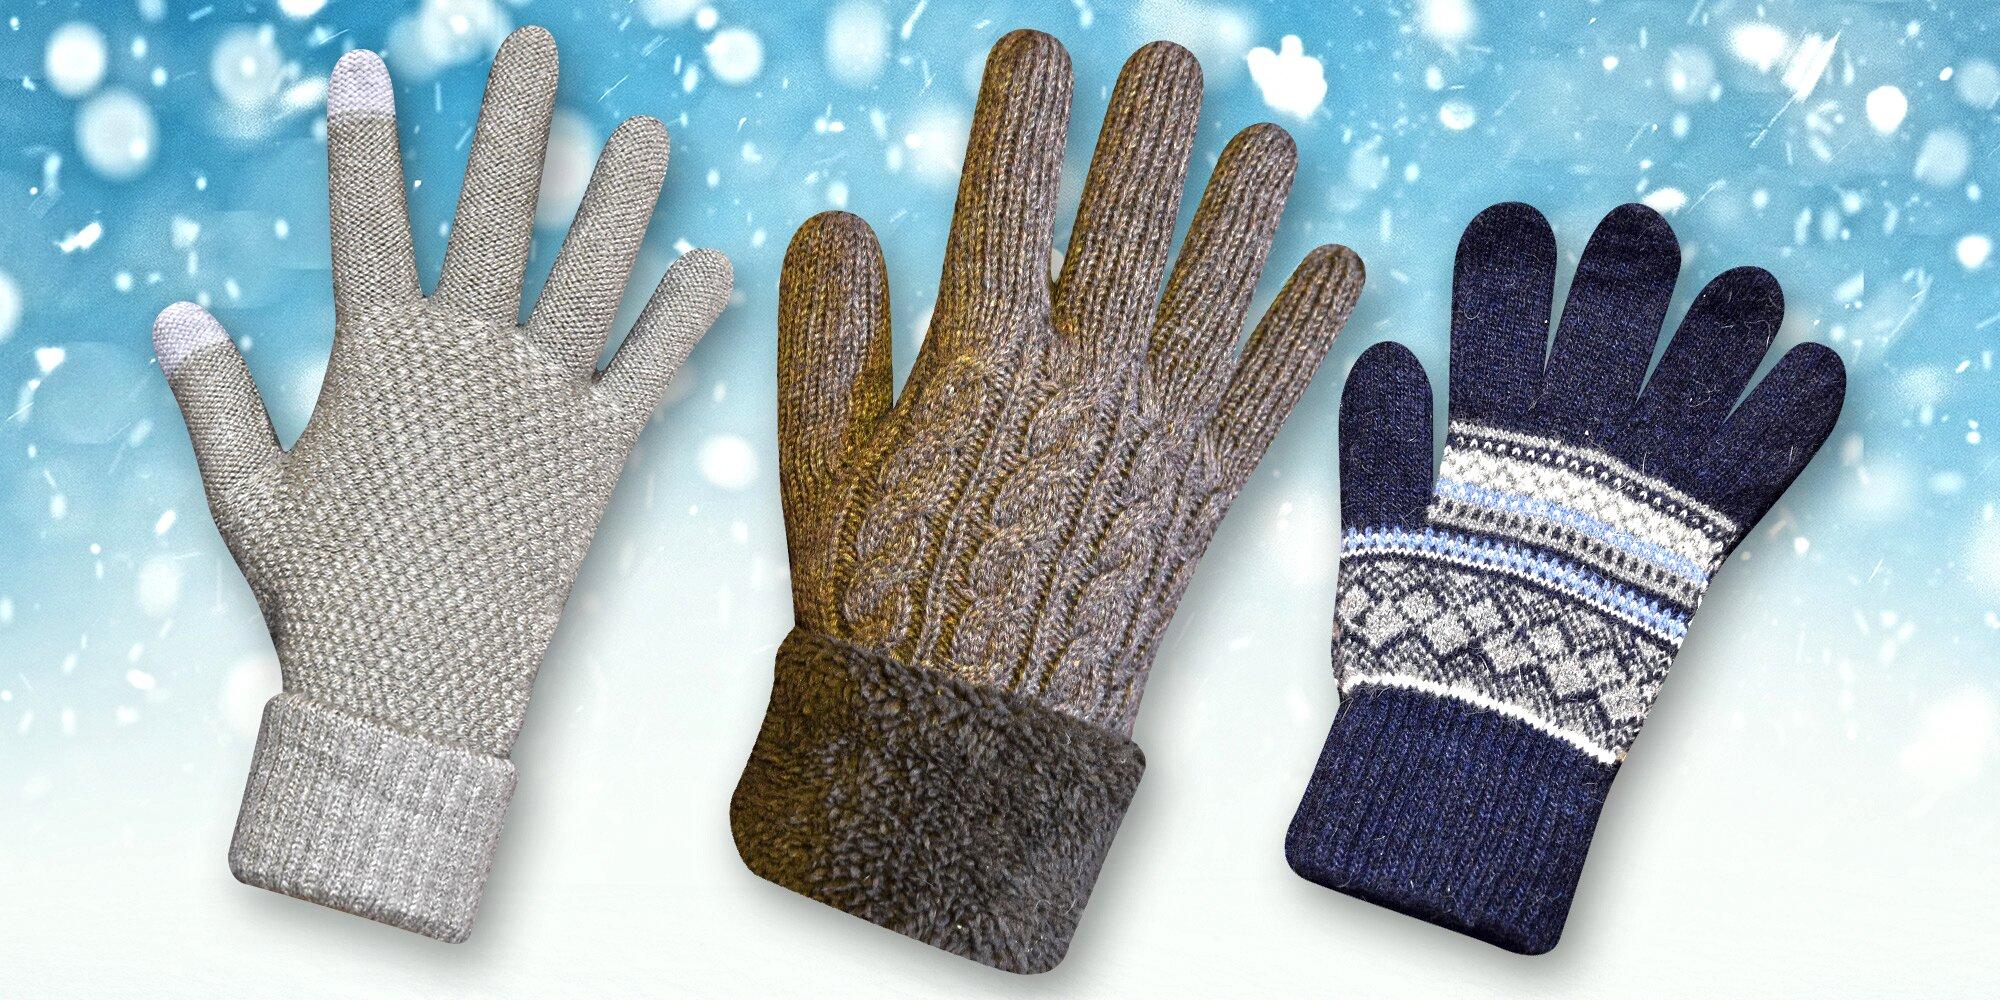 Dámské rukavice na displej i extra teplé pánské  4280127fe1